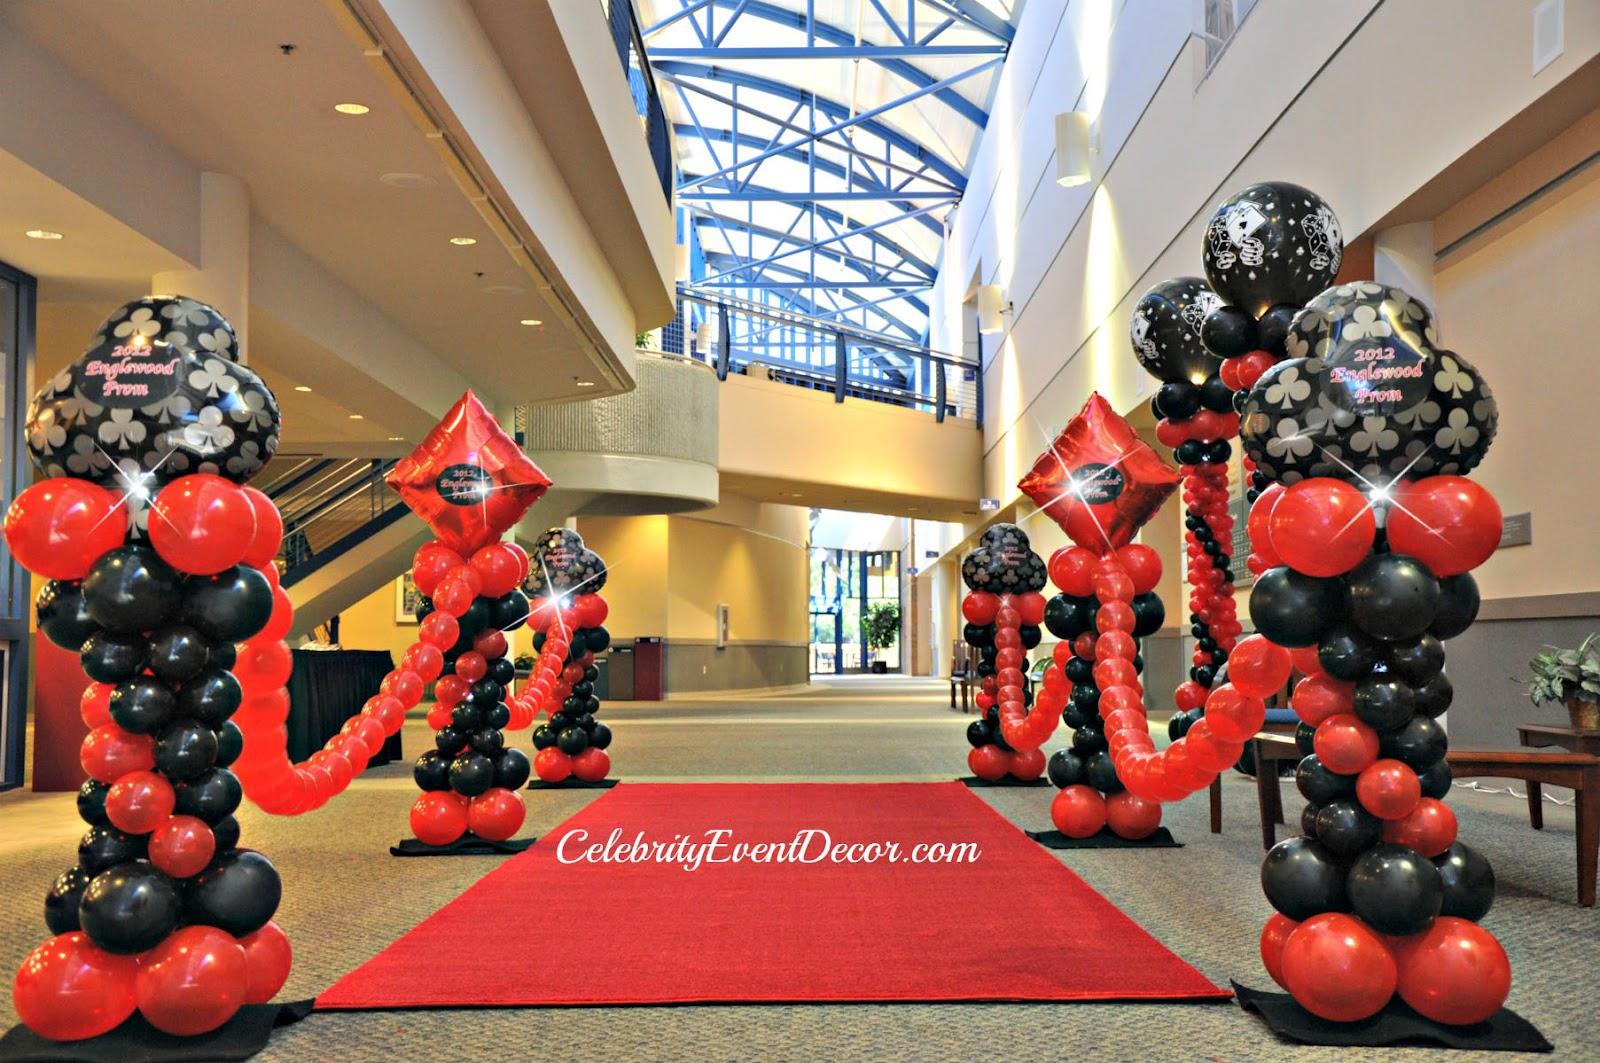 Casino Decorations Red Carpet